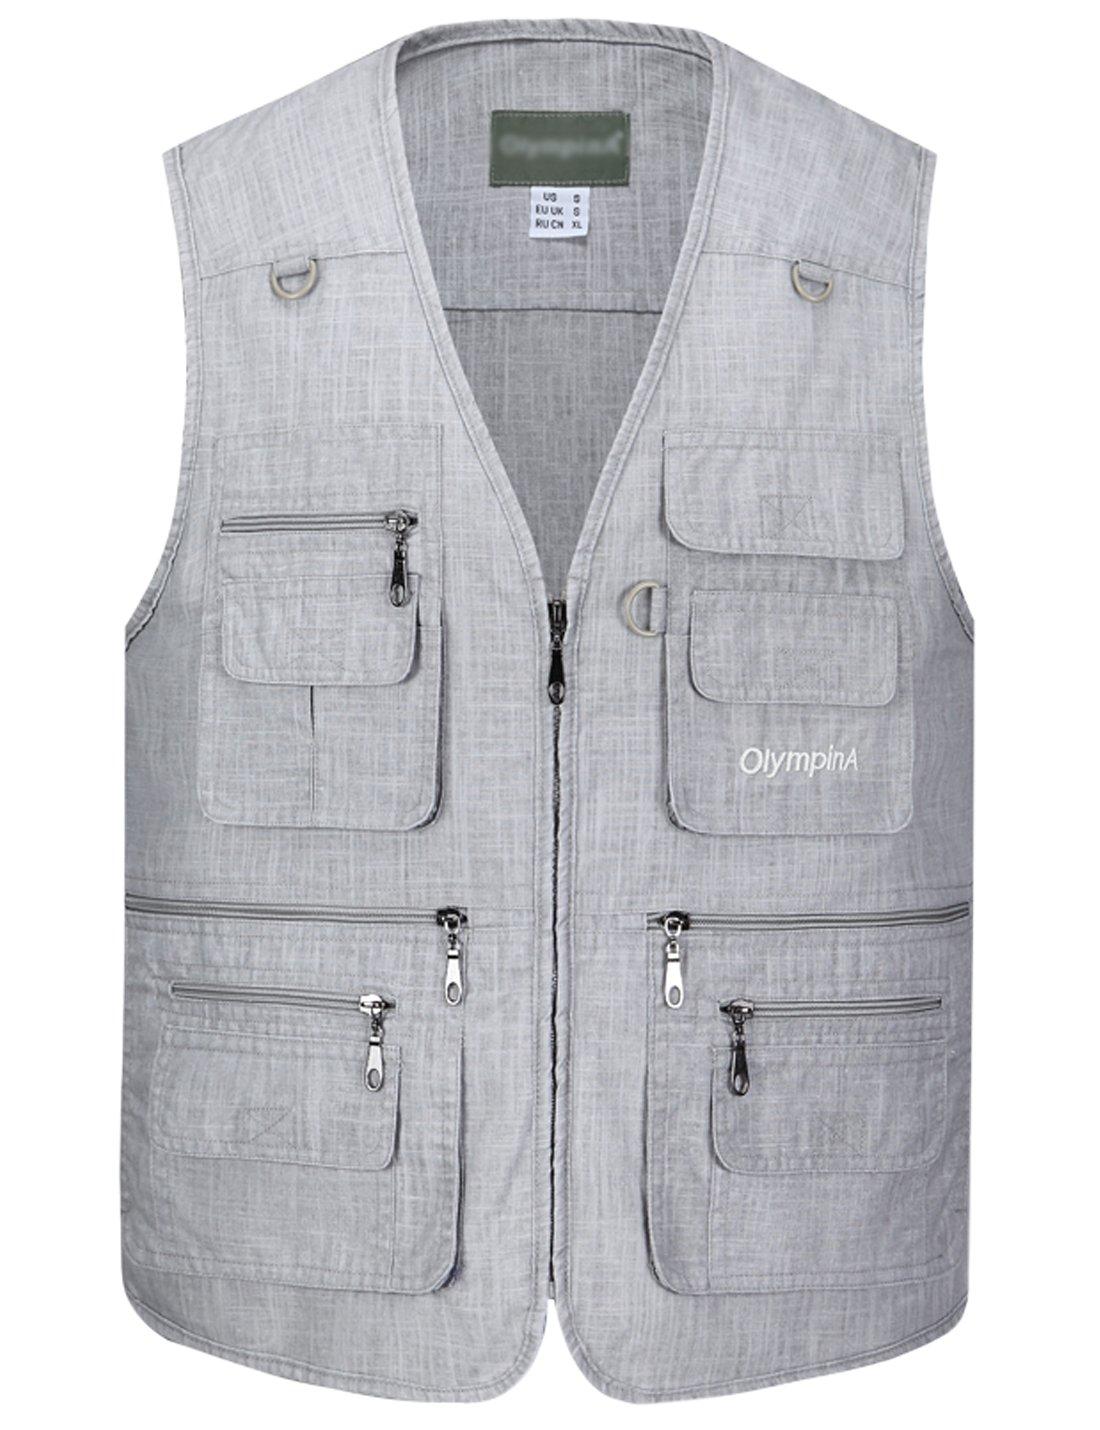 Gihuo Men's Summer Leisure Outdoor Pockets Fish Photo Journalist Vest Plus Size (X-Large, Light Grey#2)